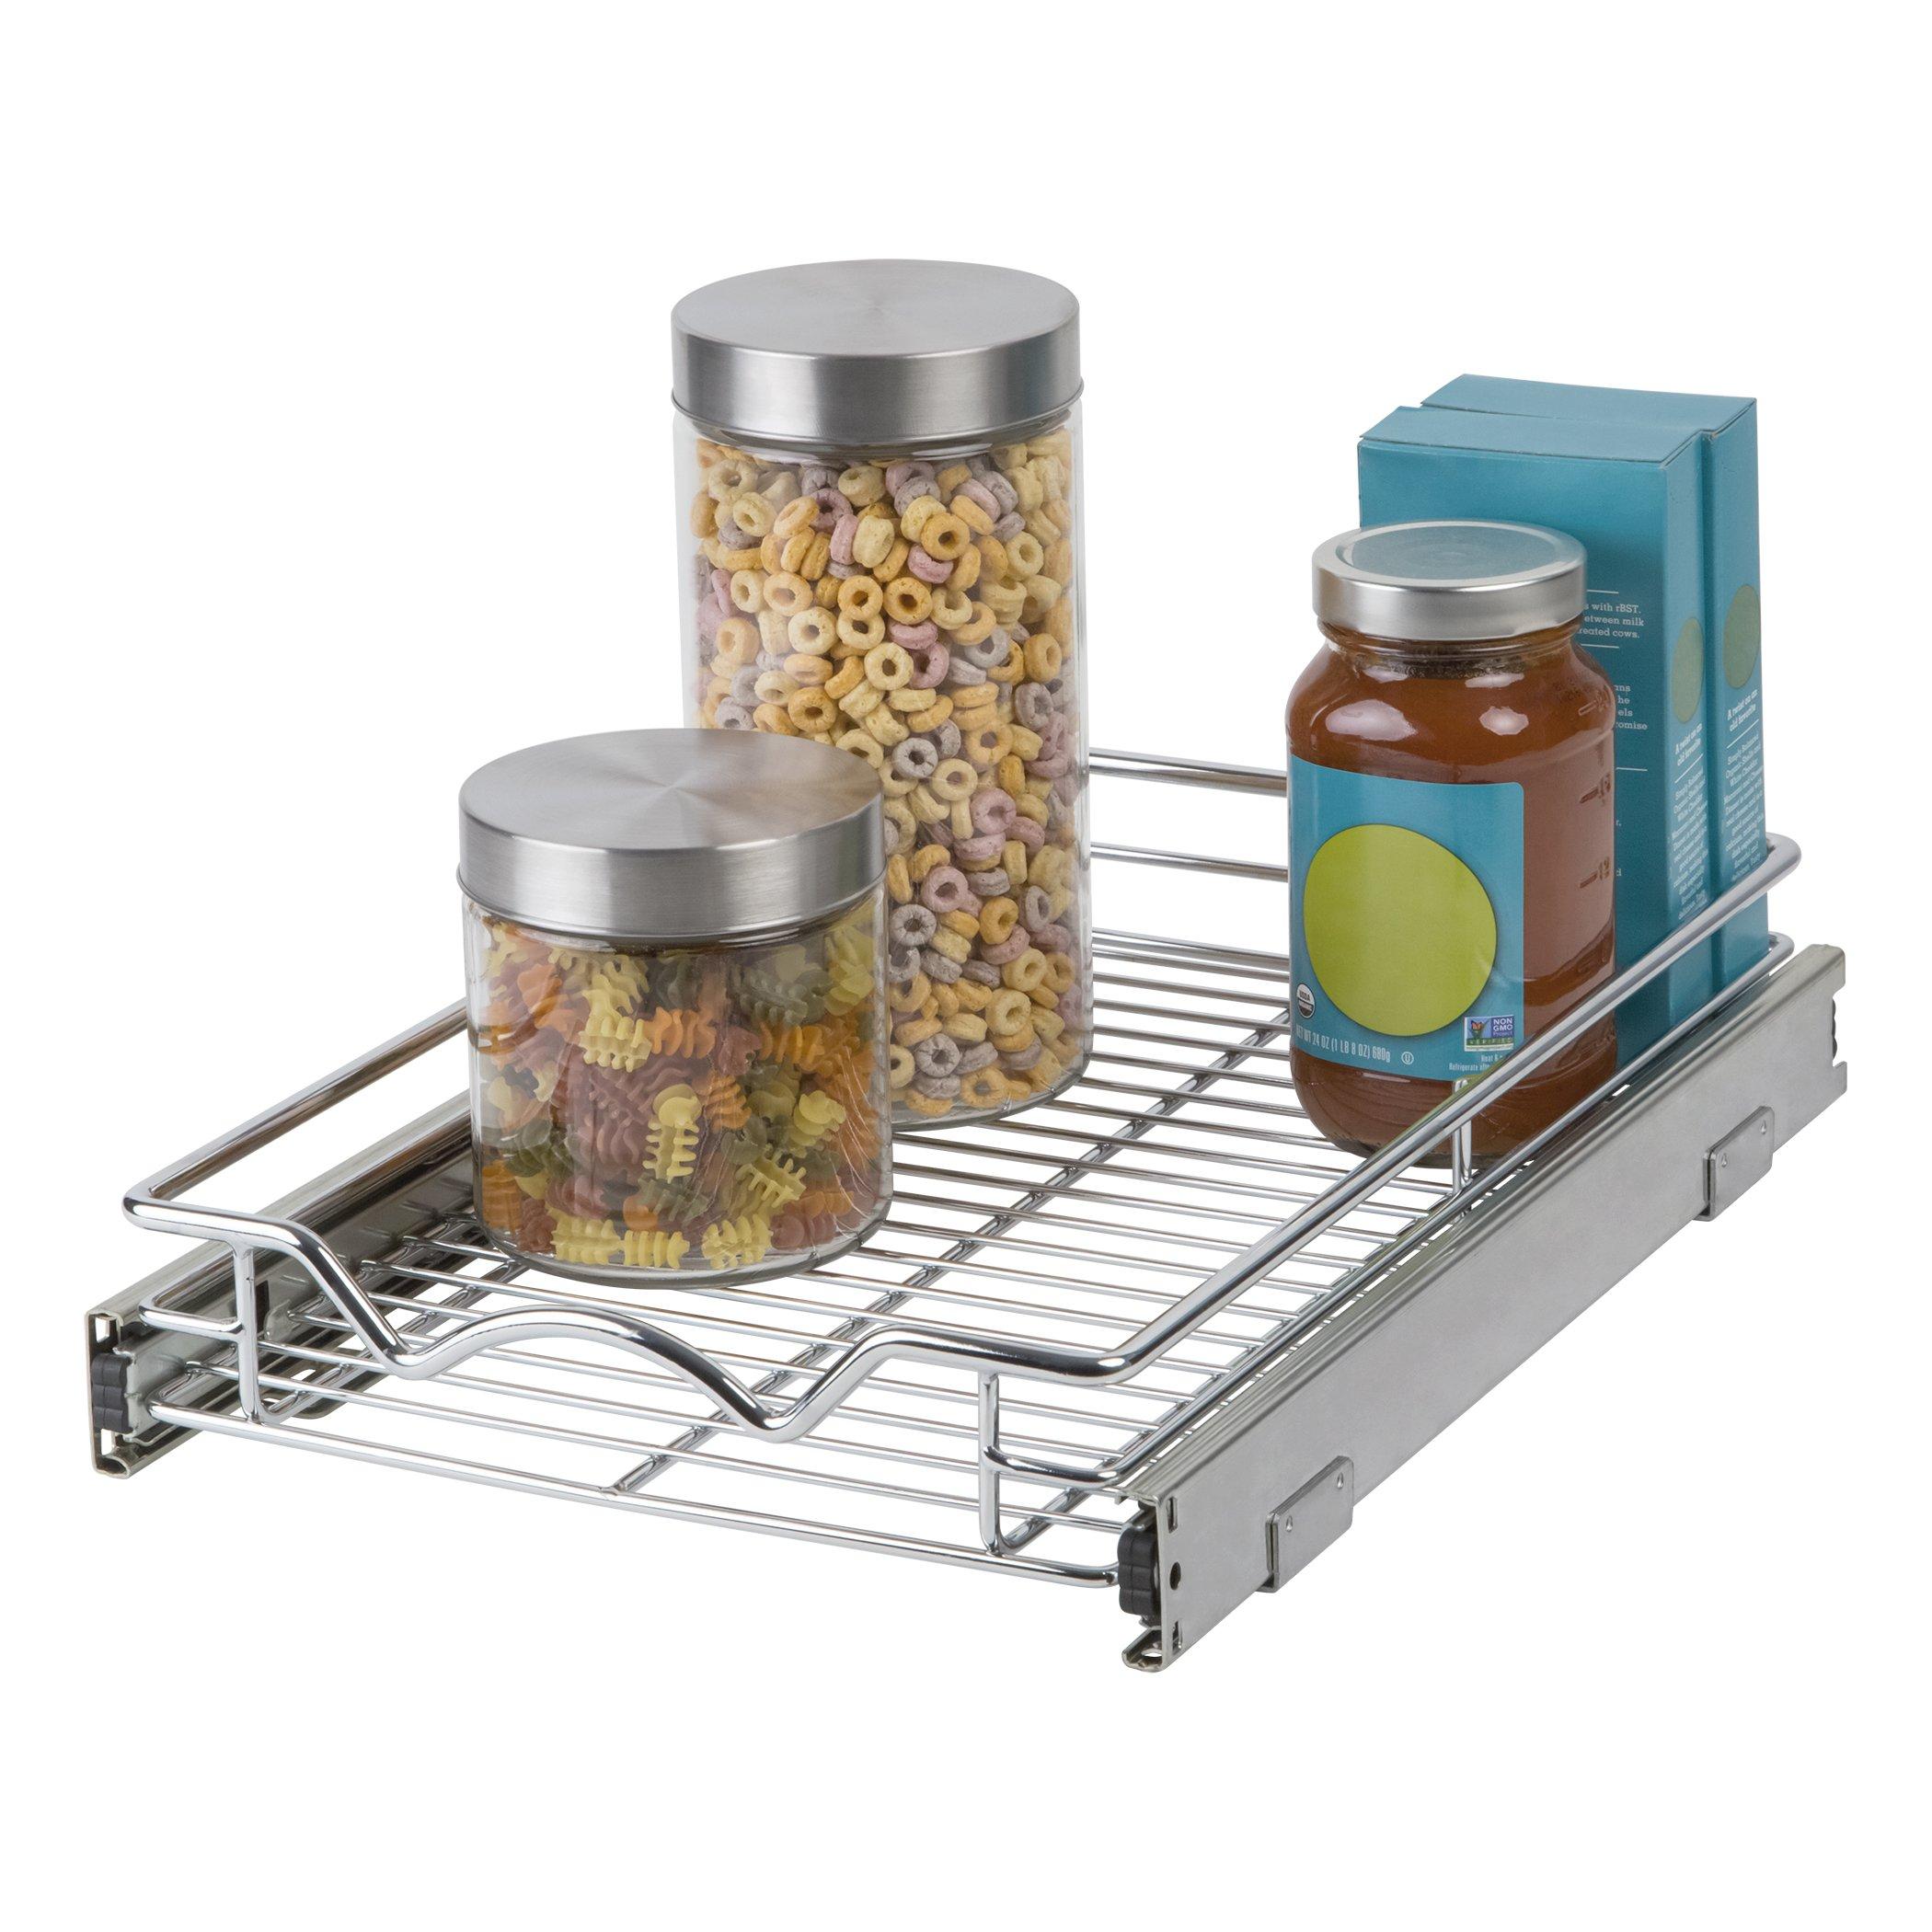 "Slide Out Cabinet Organizer - Chrome One Tier 11''Wx 18""D, Slide Out Kitchen Cabinet Organizer and Pull Out Under Cabinet Pots & Pans Sliding Shelf by Richards Homewares"